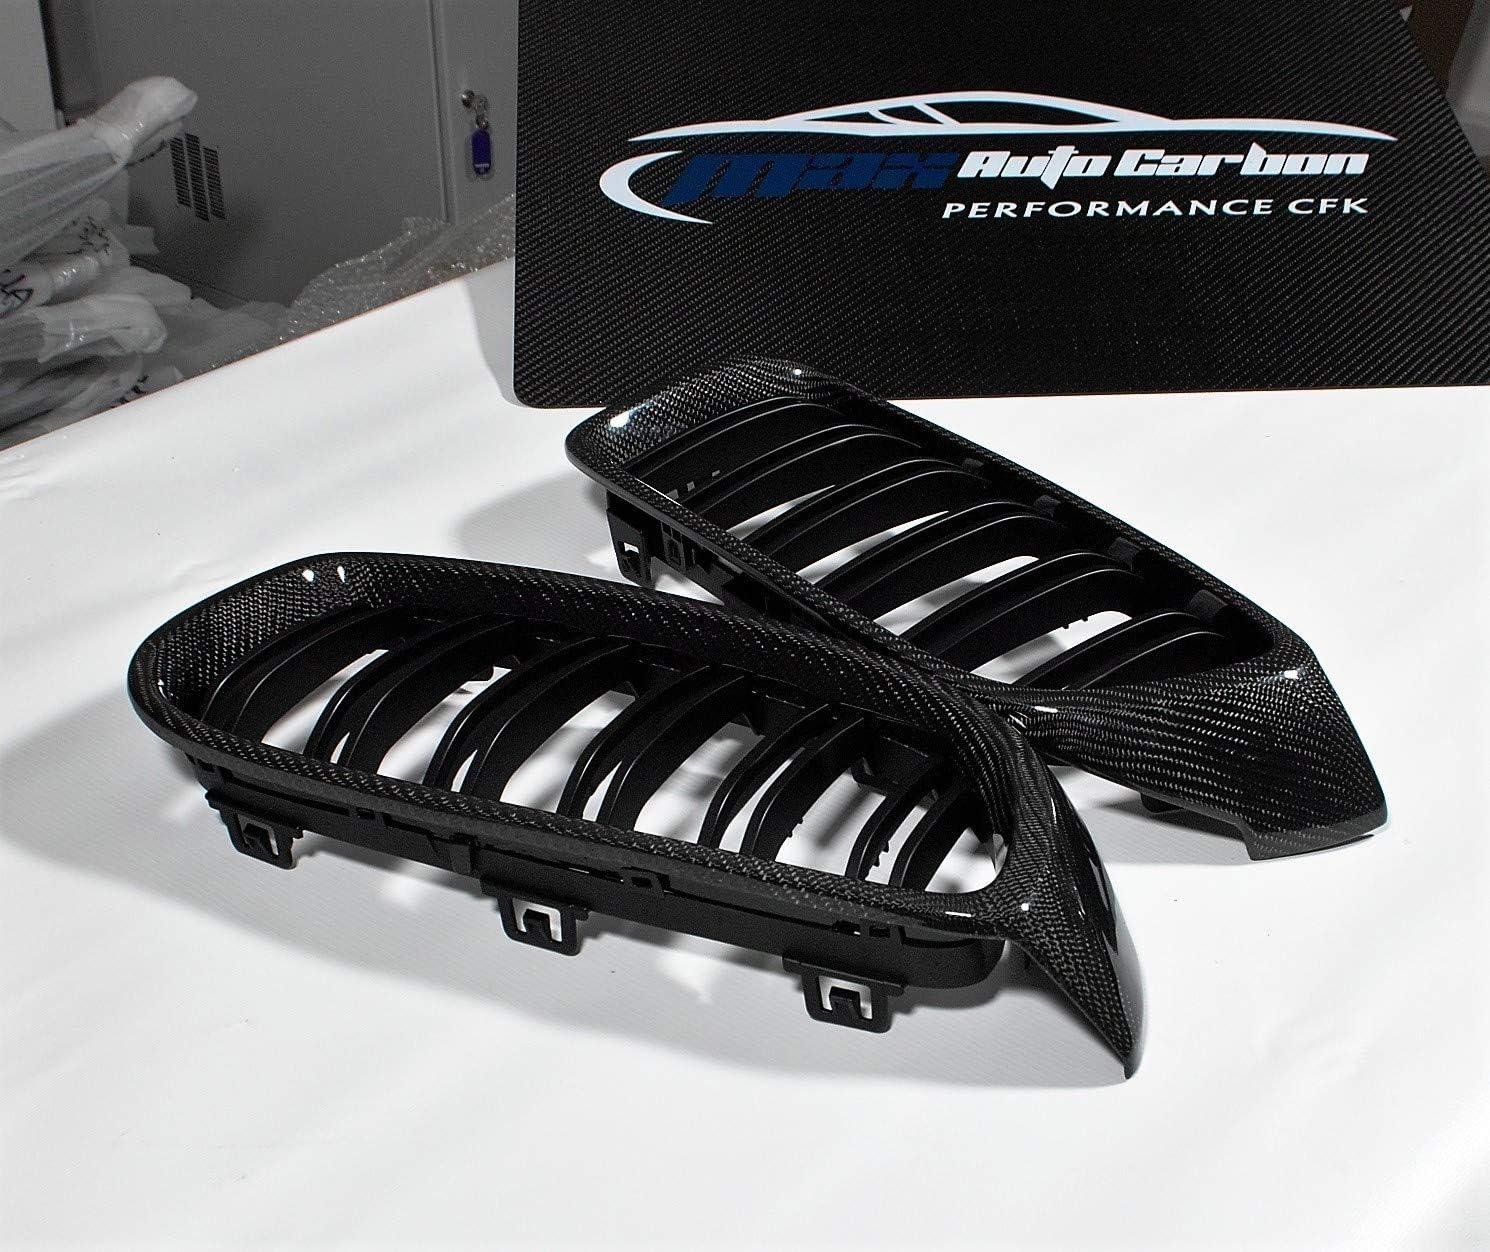 Max Auto Carbon Matt Front Grill Nieren Passend 4er F32 F33 F36 M3 M4 F80 F82 F83 Auto